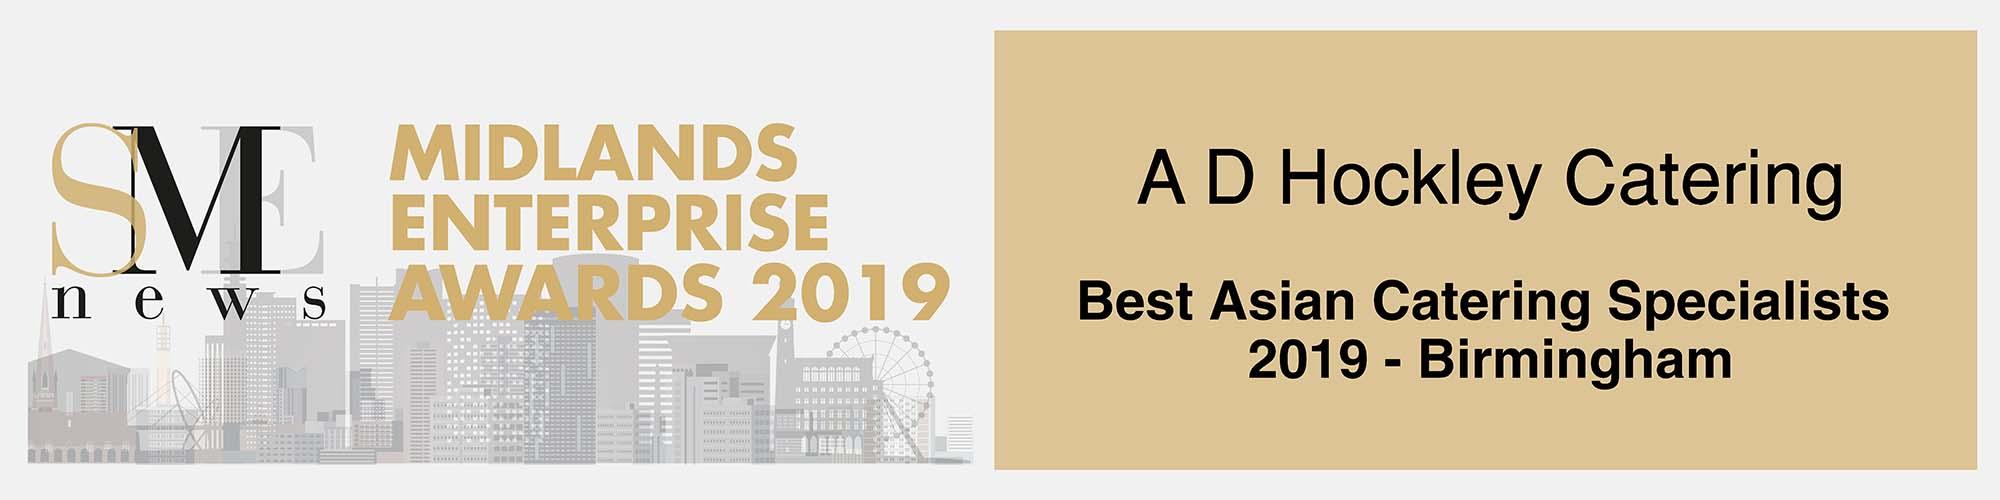 UK Midlands Awards Winners 2019 Banner